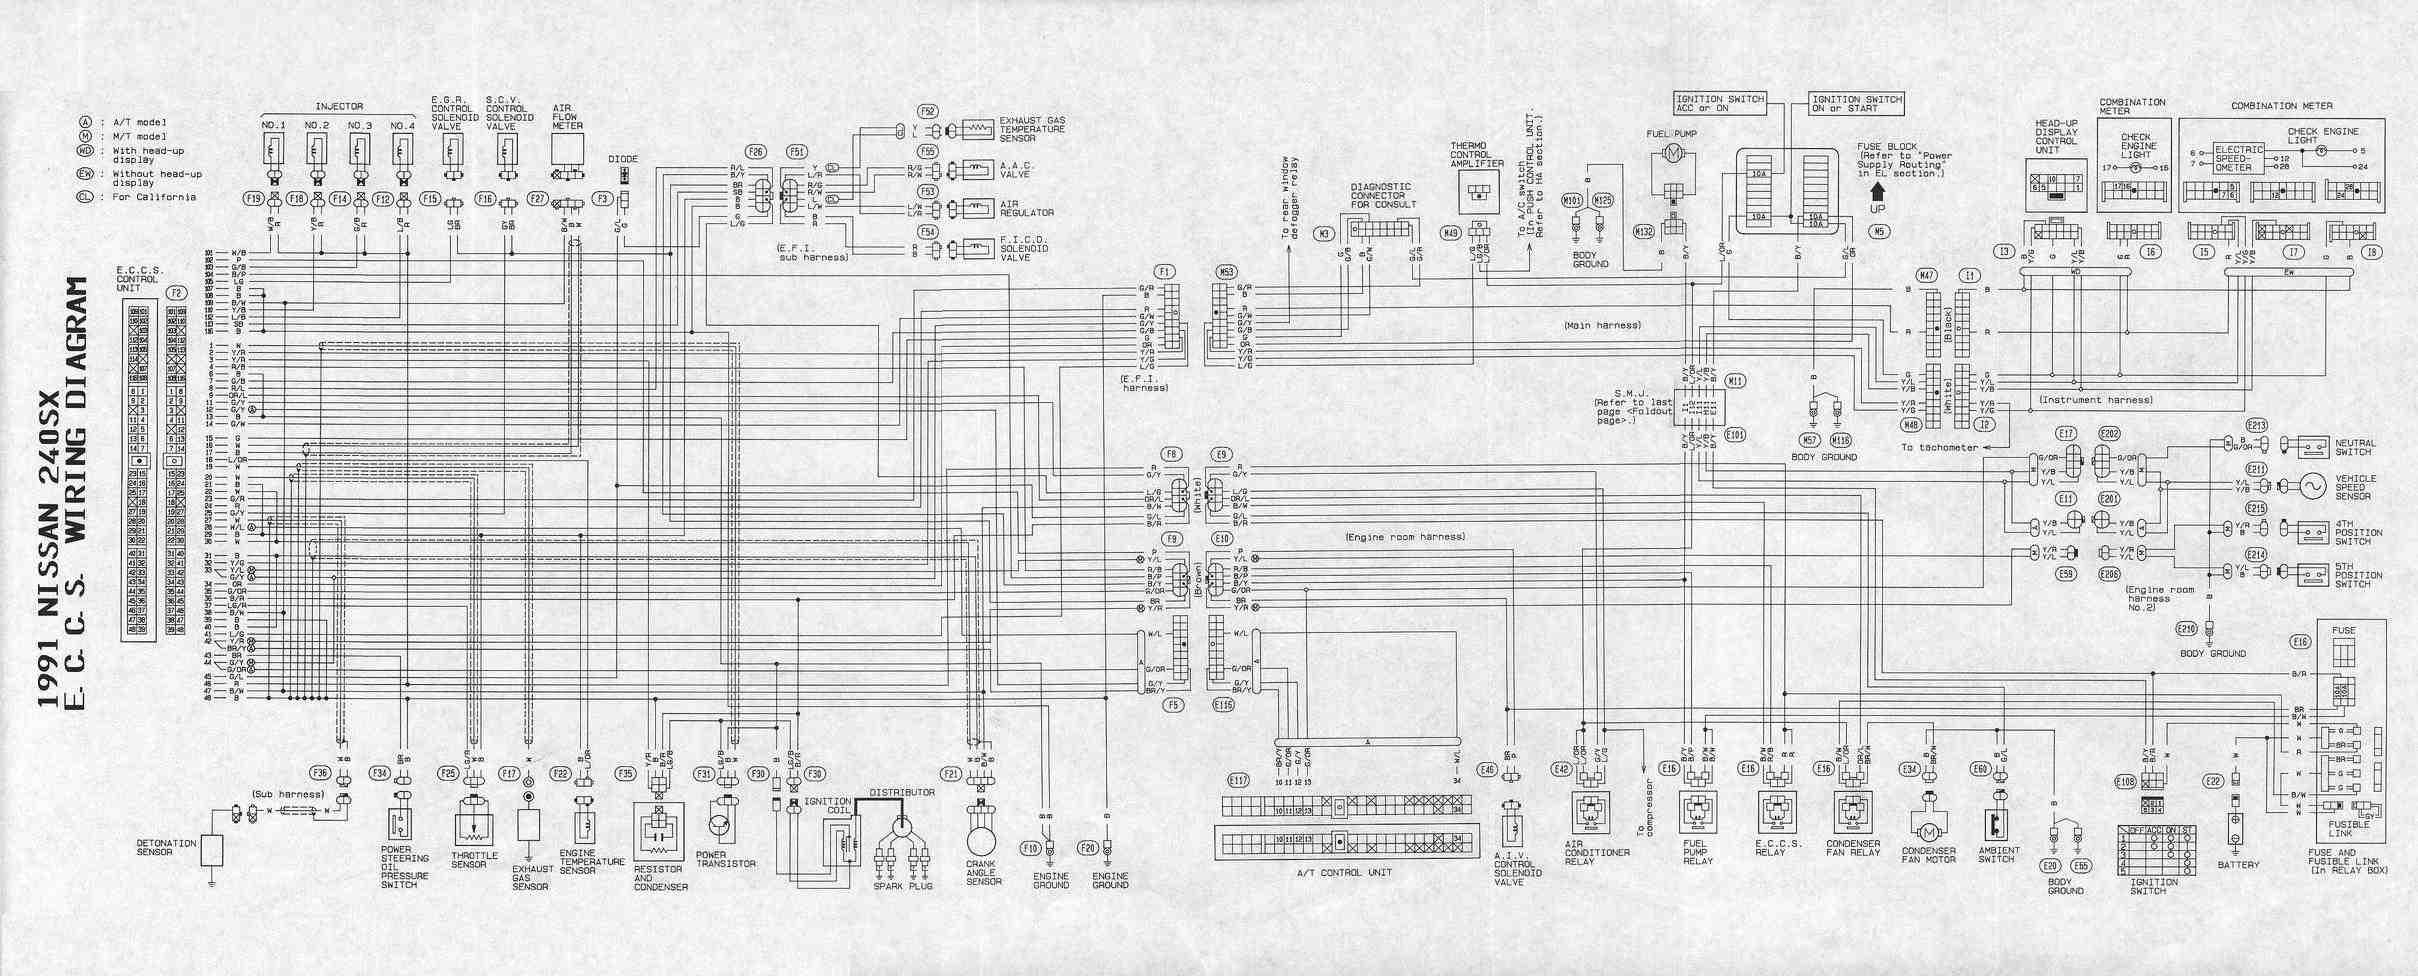 ka24de wiring diagram 95 example electrical wiring diagram u2022 rh cranejapan co 1991 nissan 240sx fuse panel diagram 1991 nissan 240sx headlight wiring diagram